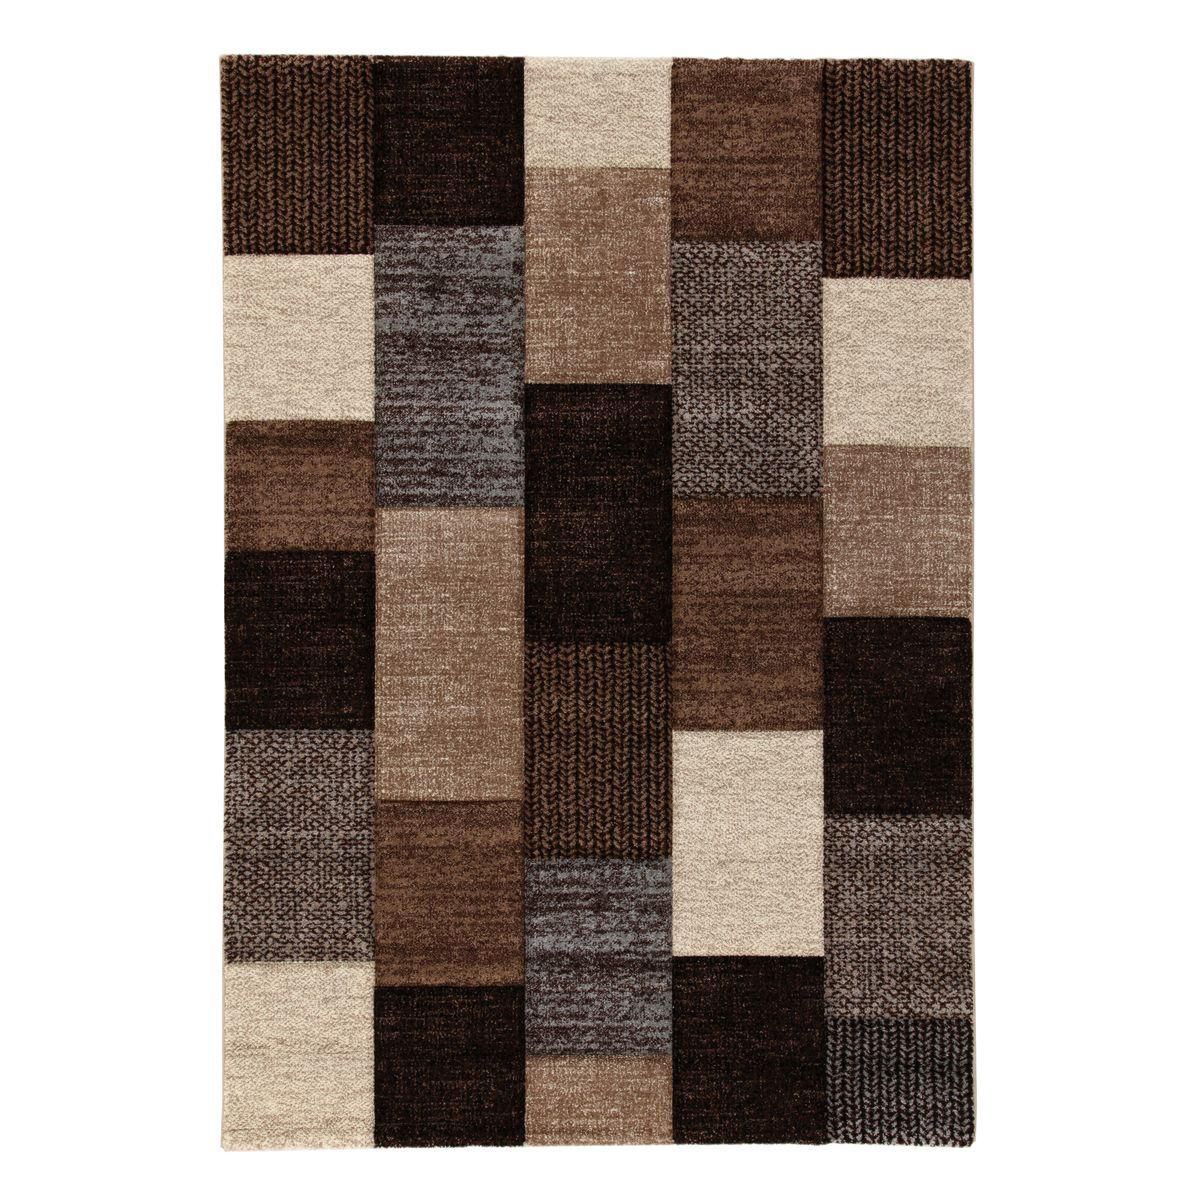 Tappeto textures beige marrone 160 x 230 cm prezzi e for Copriwater leroy merlin